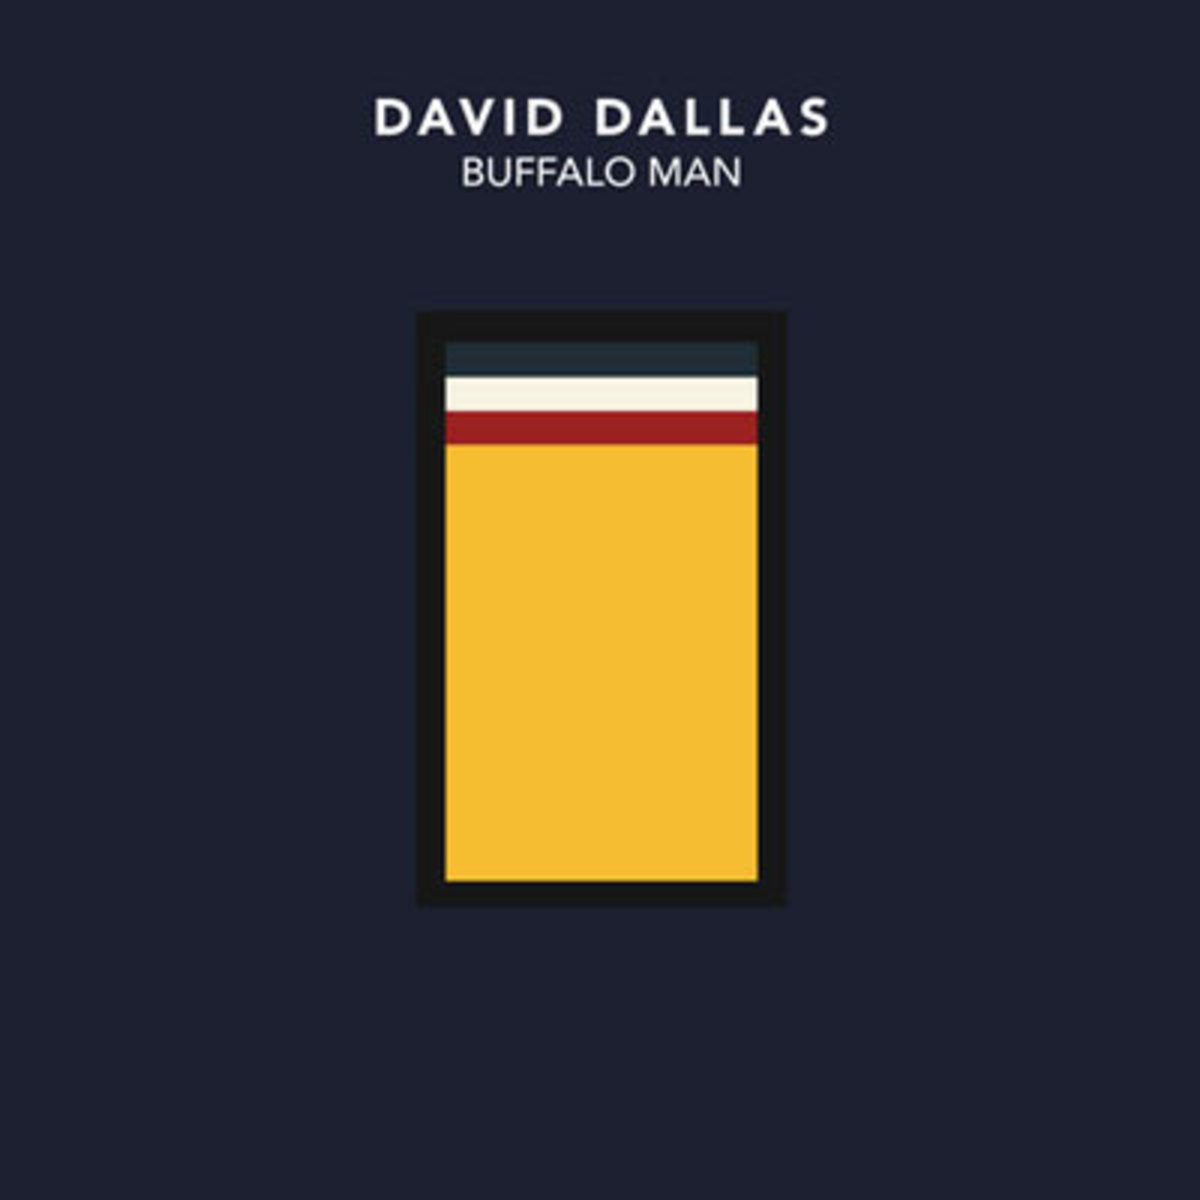 daviddallas-buffaloman.jpg